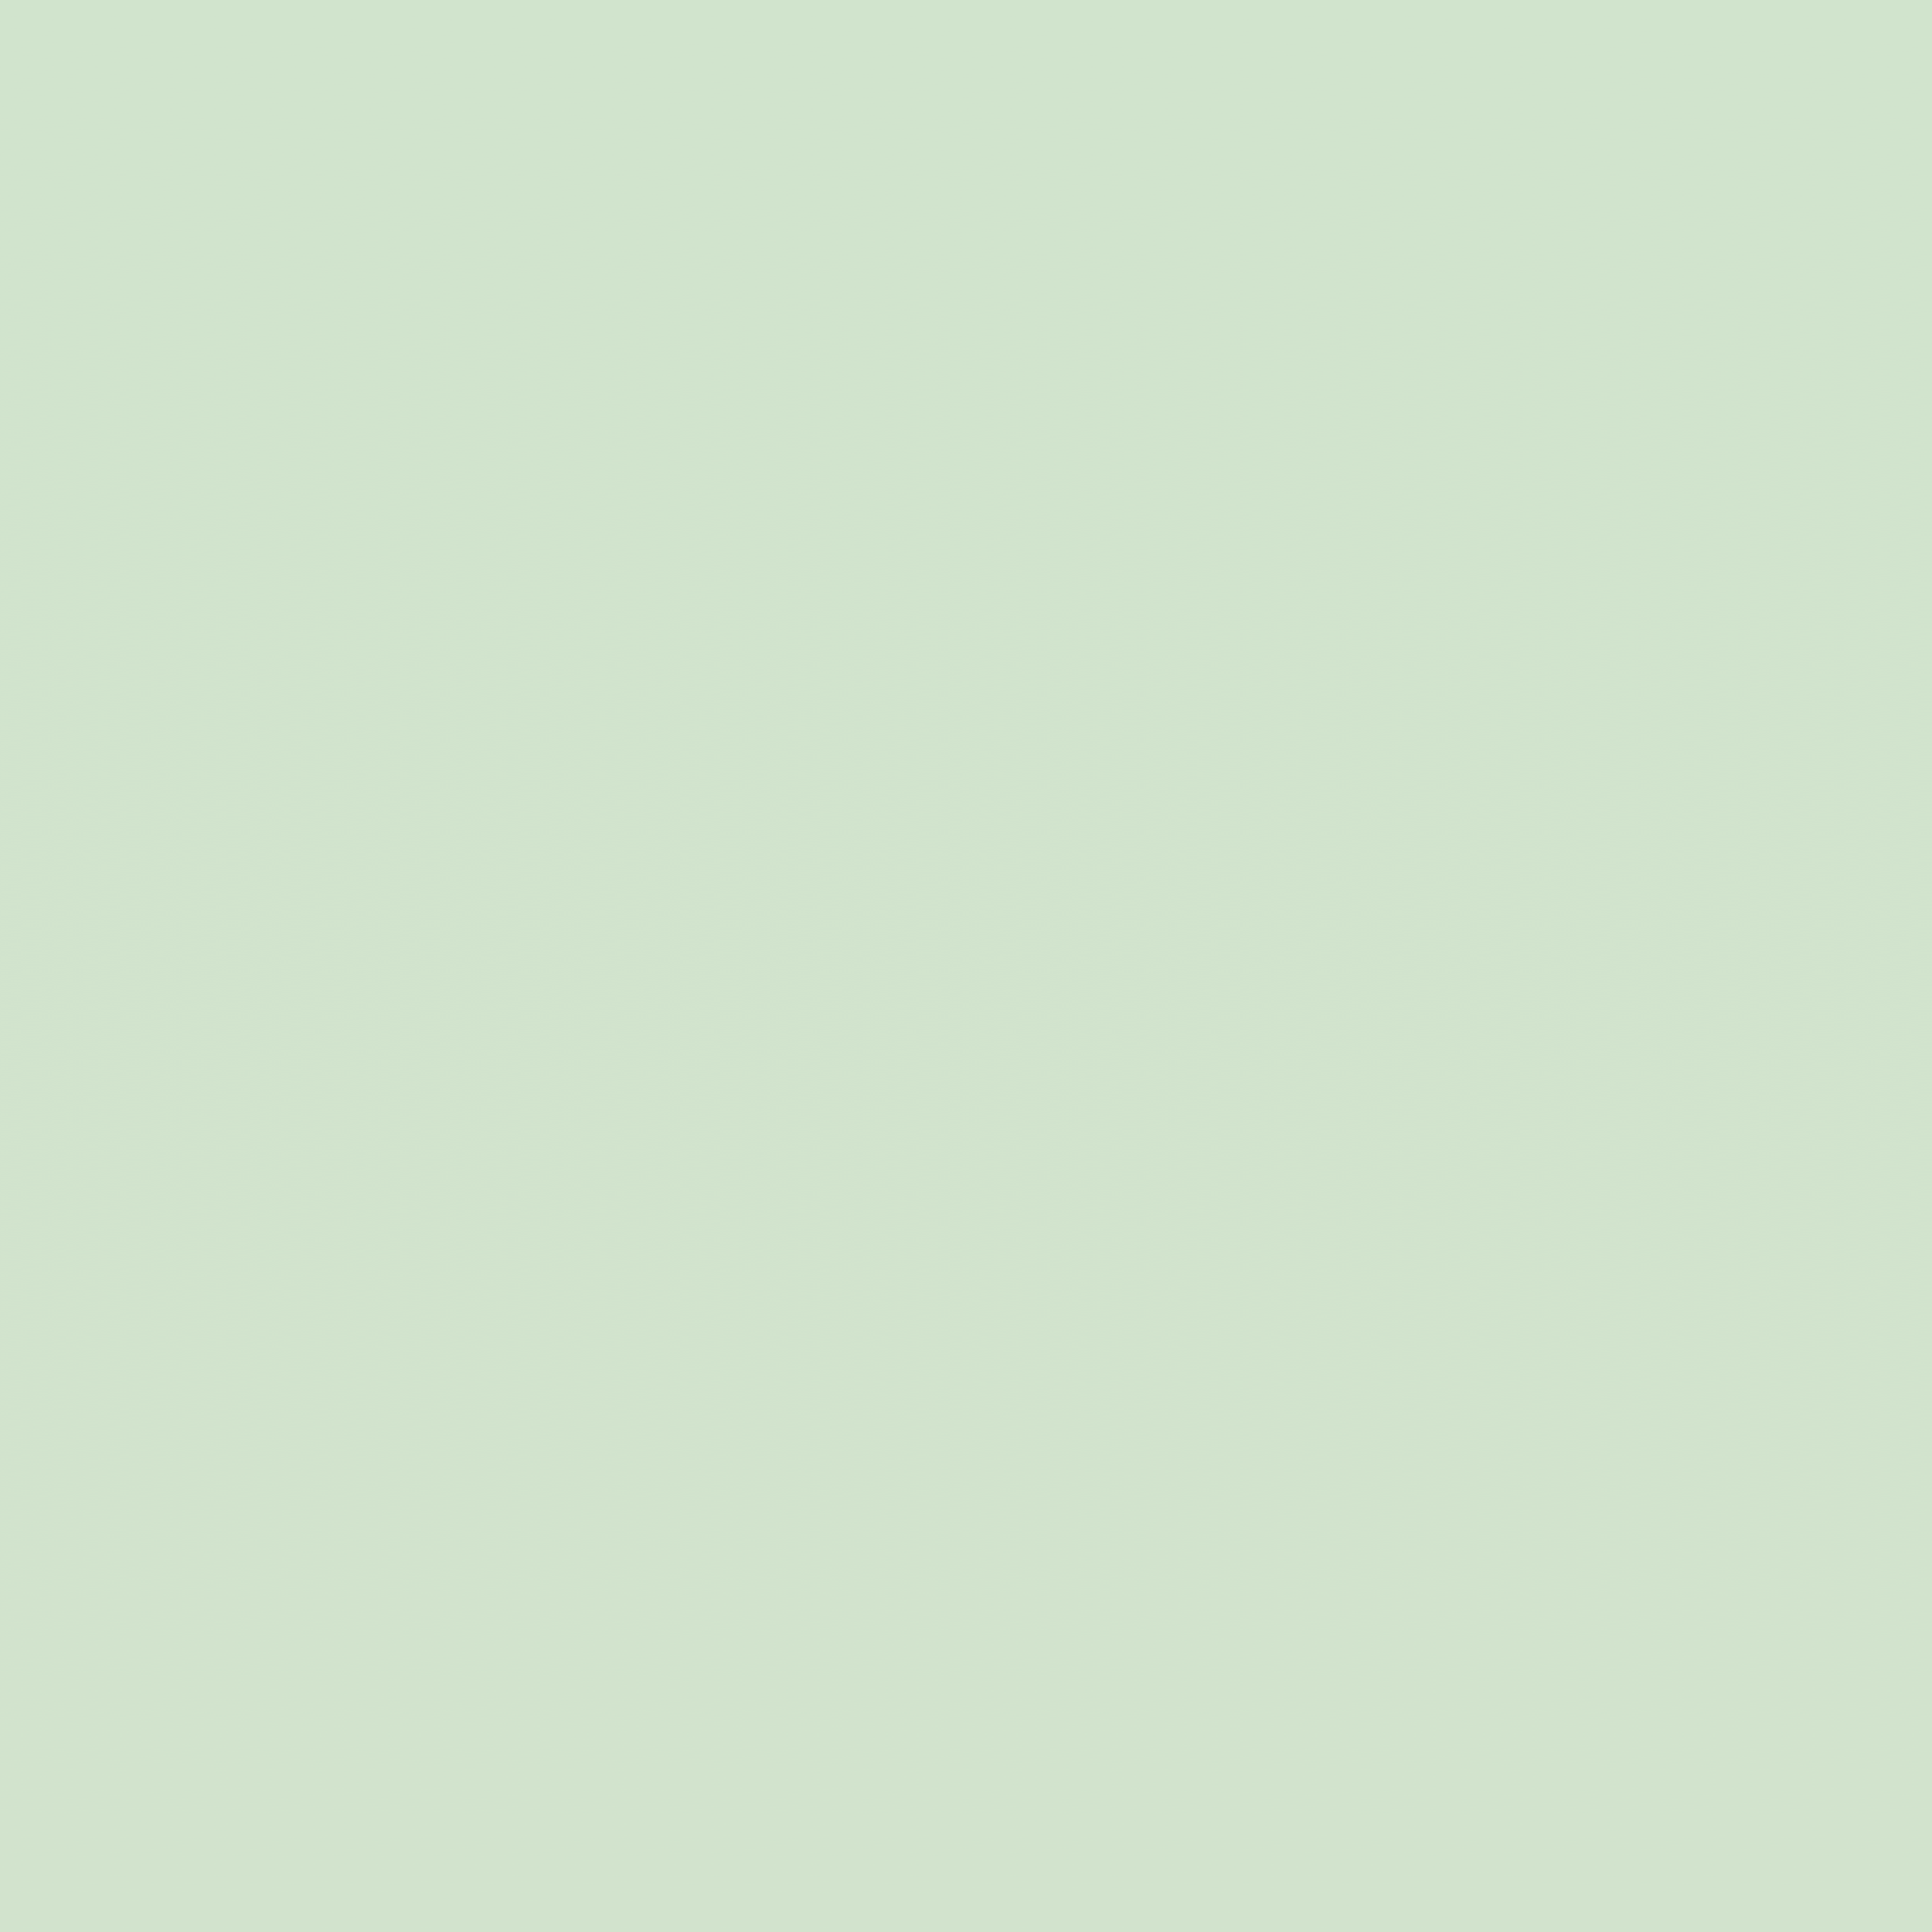 green gradient iPad wallpaper